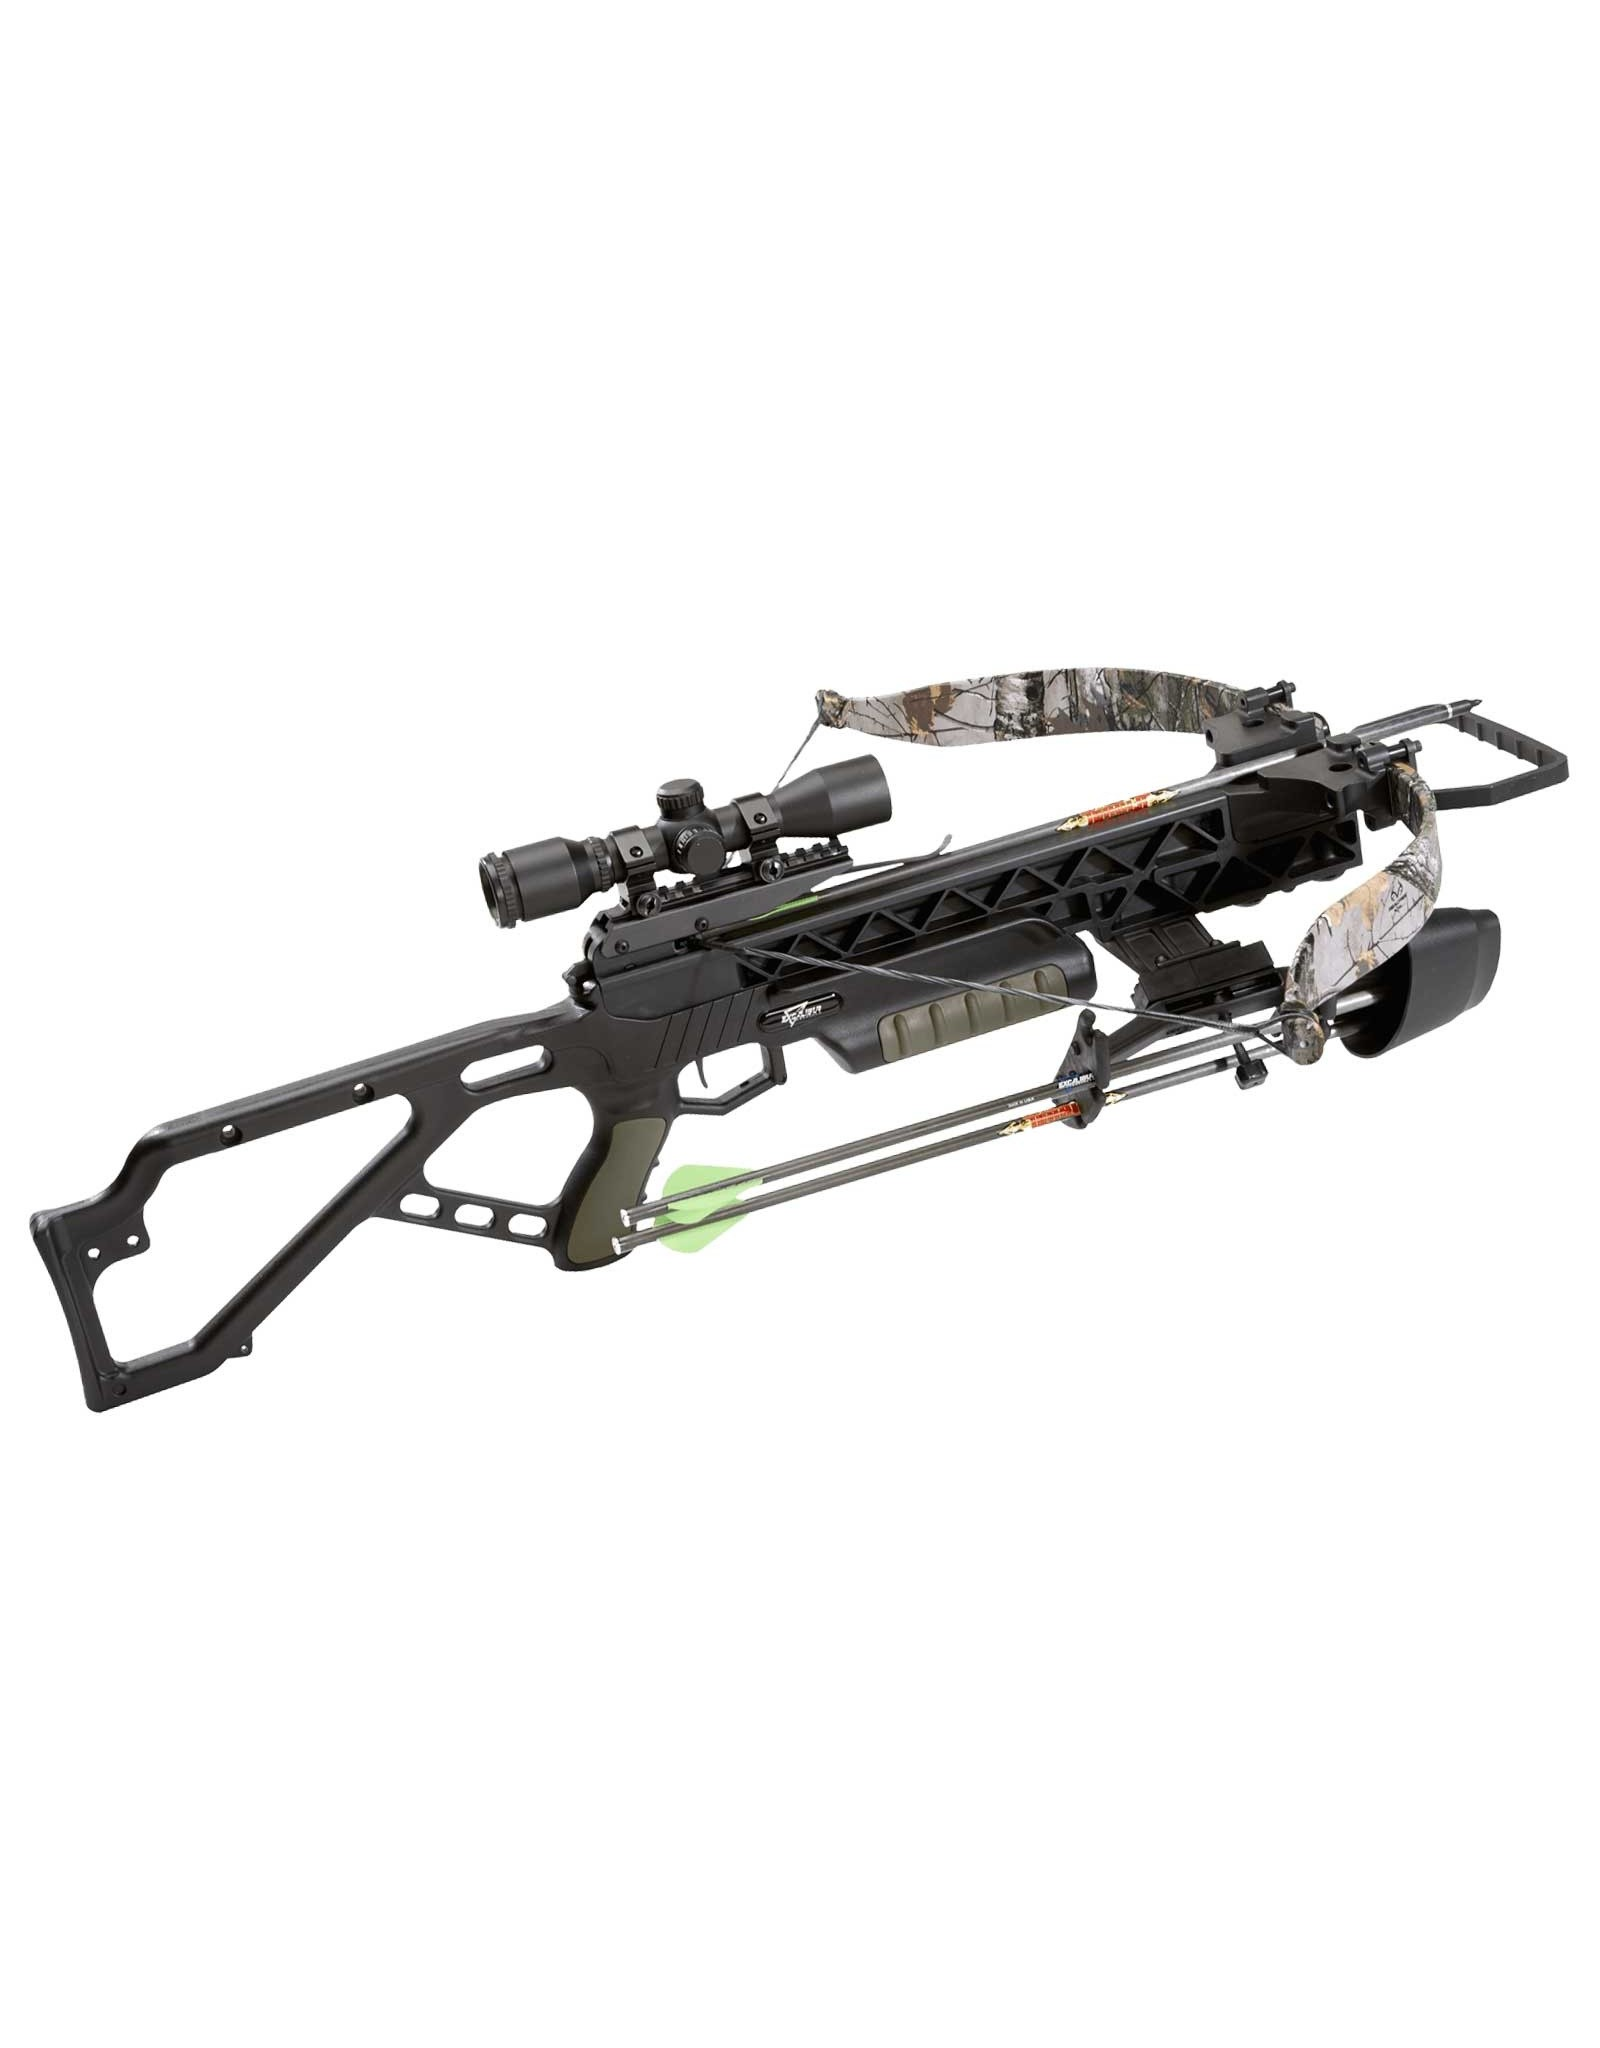 Excalibur Crossbows EXCALIBUR MATRIX GRZ 2 CROSSBOW PKG